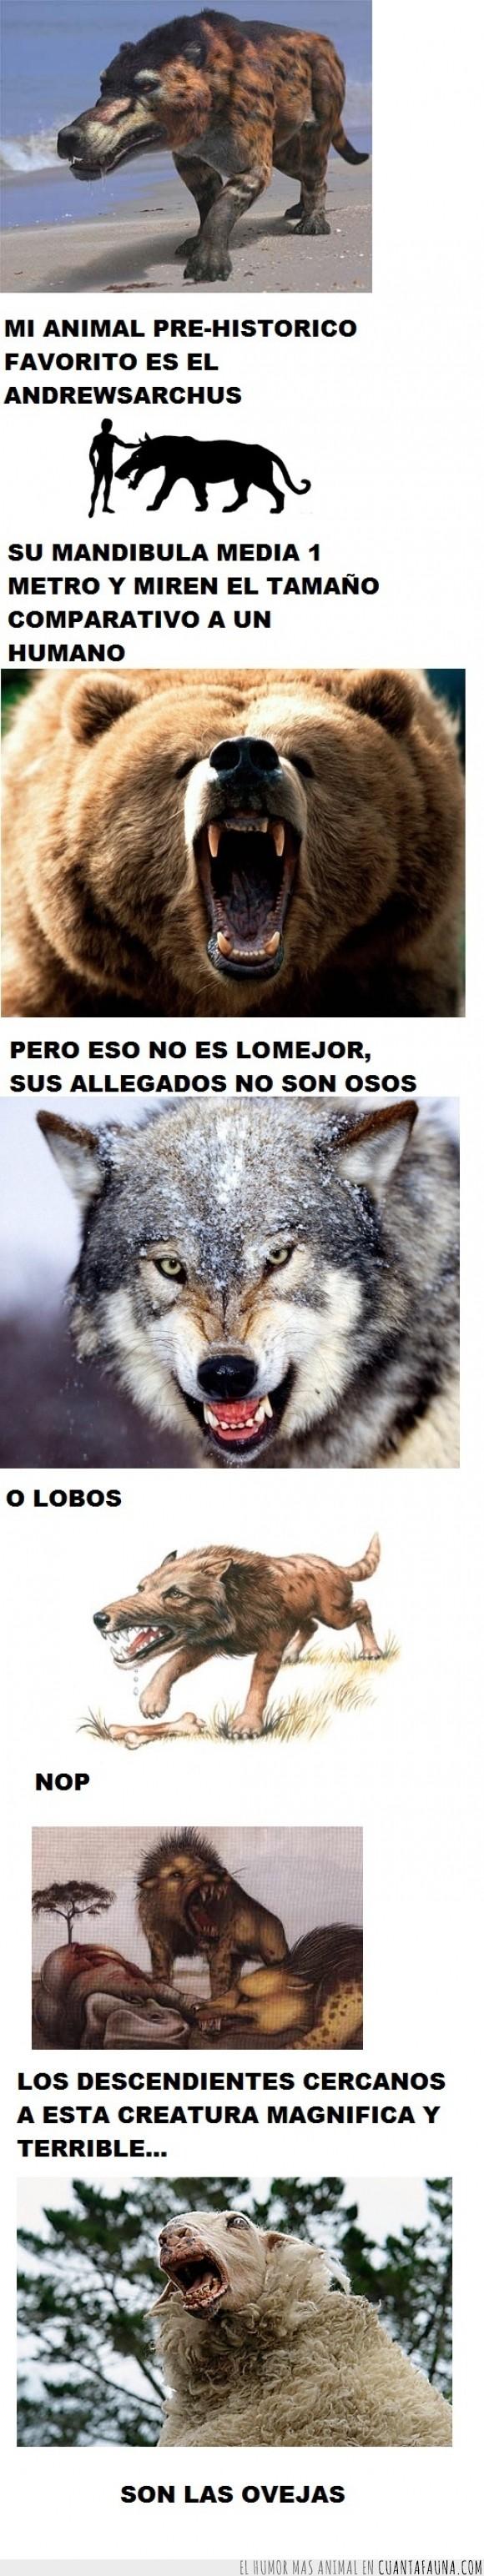 andrewsarchus,animal,feroz,lobo,miedo,oso,oveja,pre-historico,prehistoria